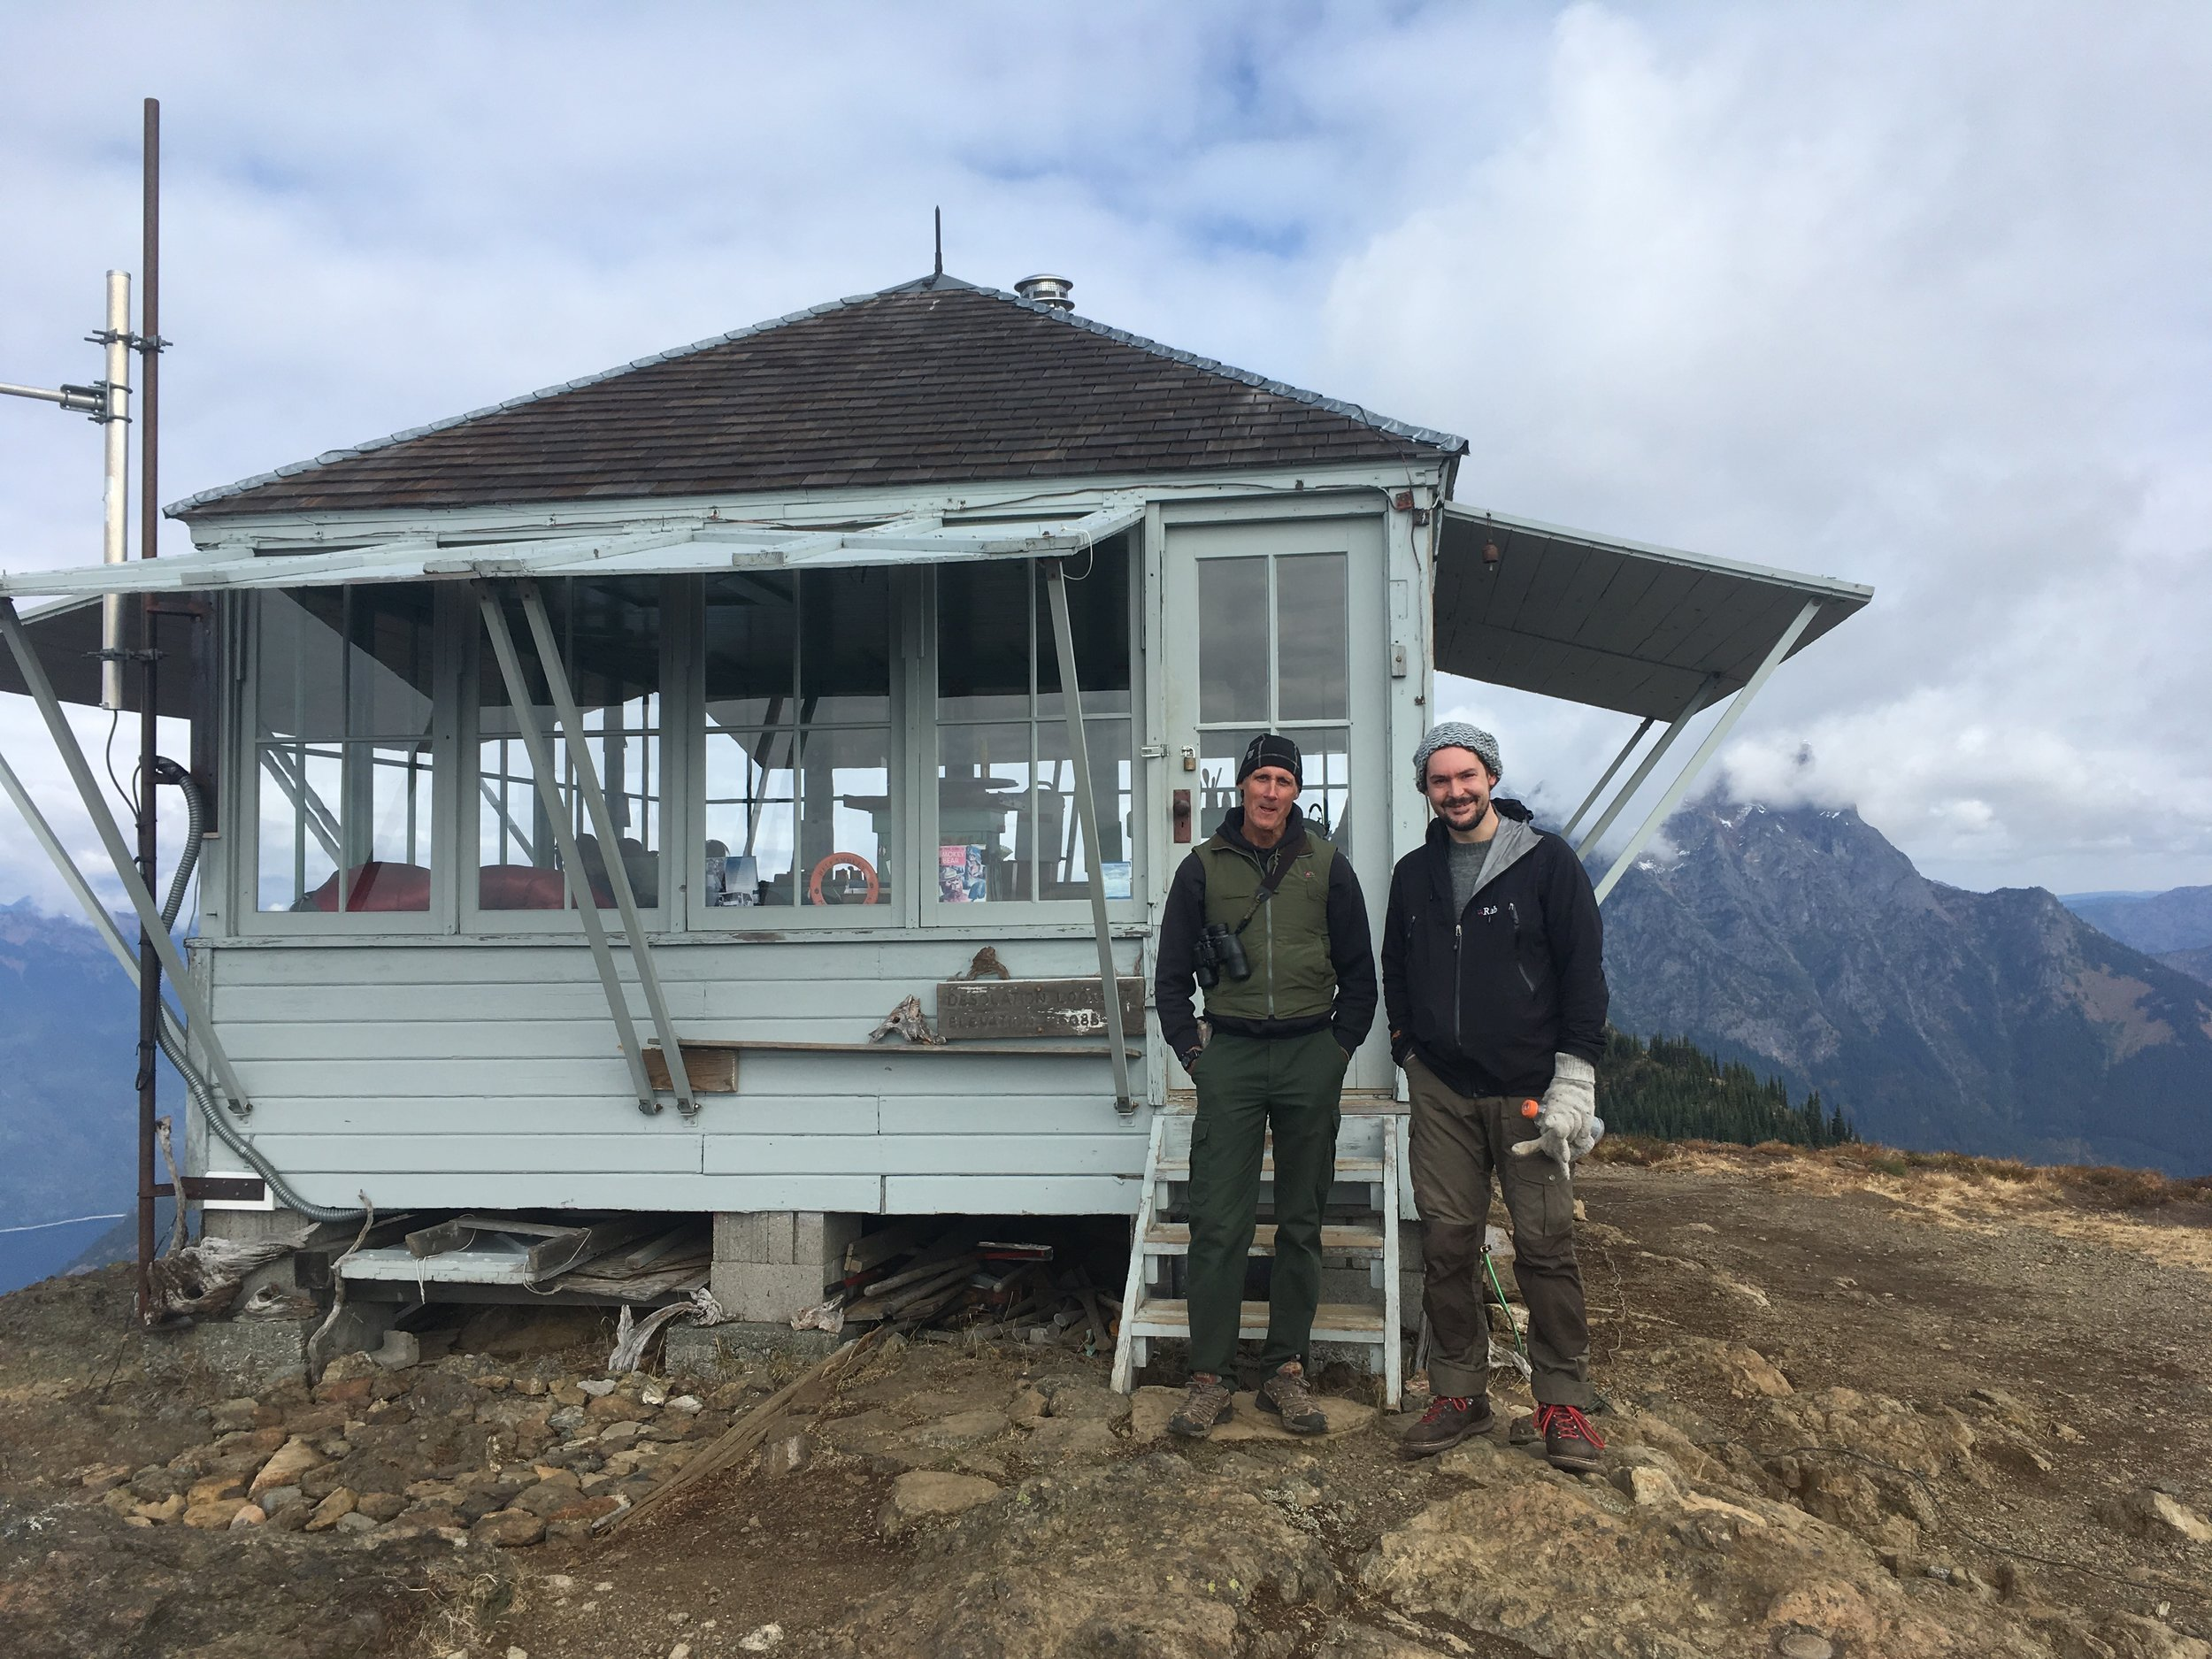 Jim Henterly and Dan Richards, Desolation Peak Lookout, WA, USA. Photograph: Colin Cady